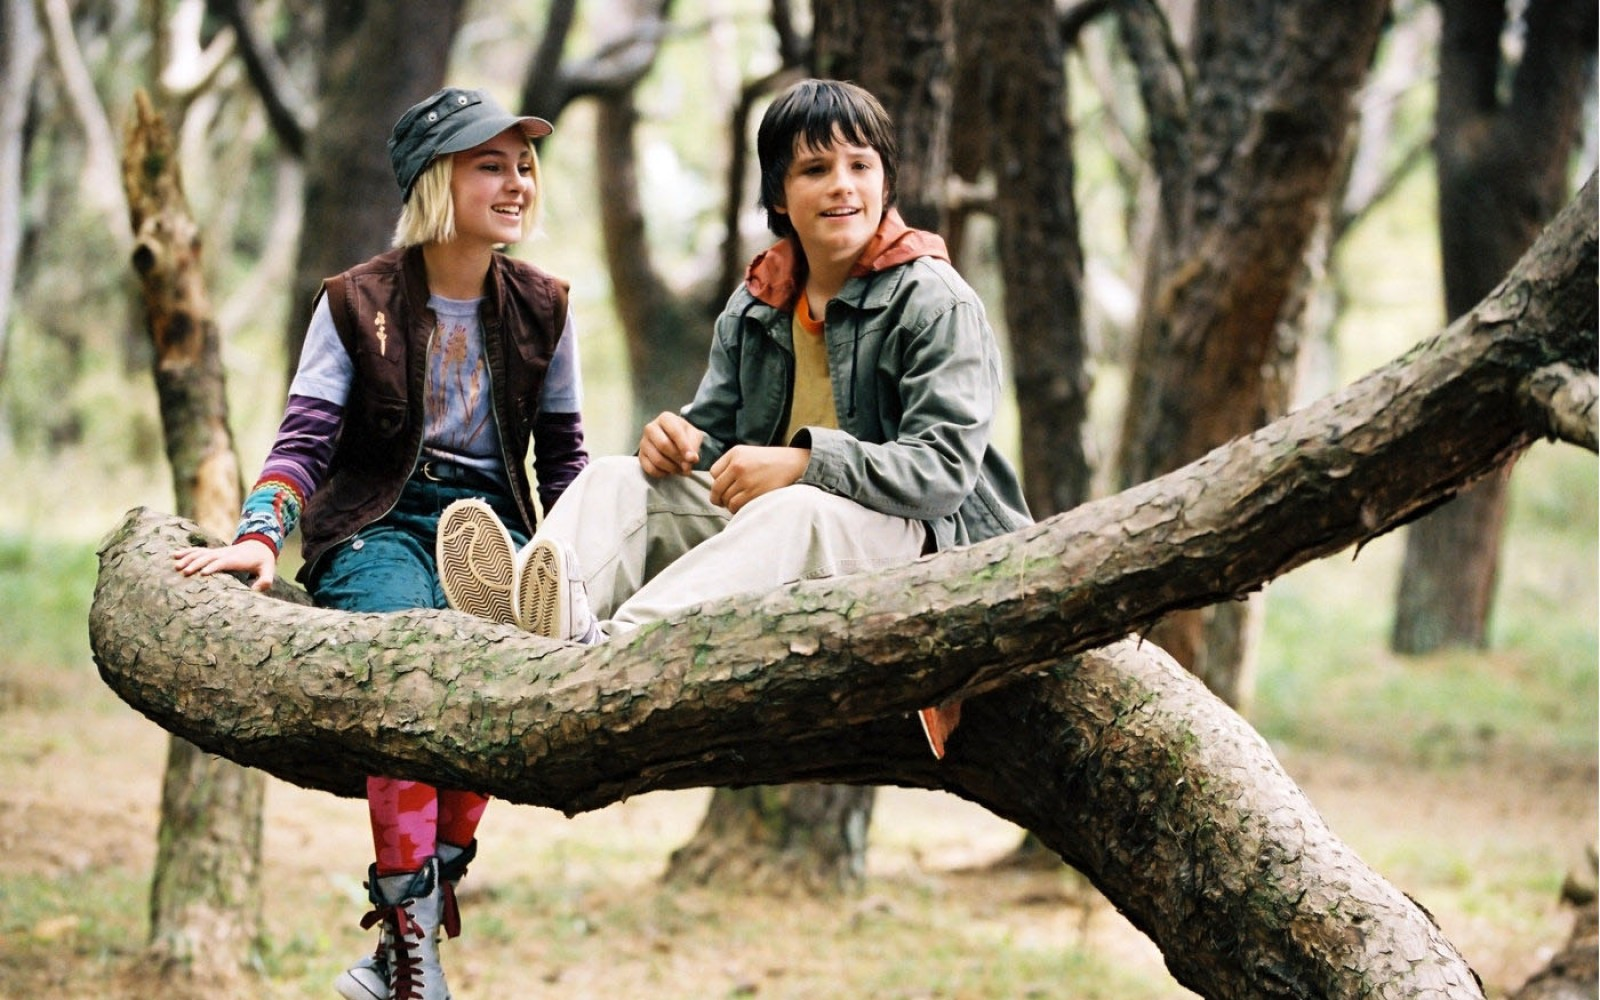 17 Nostalgic 'Bridge to Terabithia' Quotes That'll Make You Ugly Cry